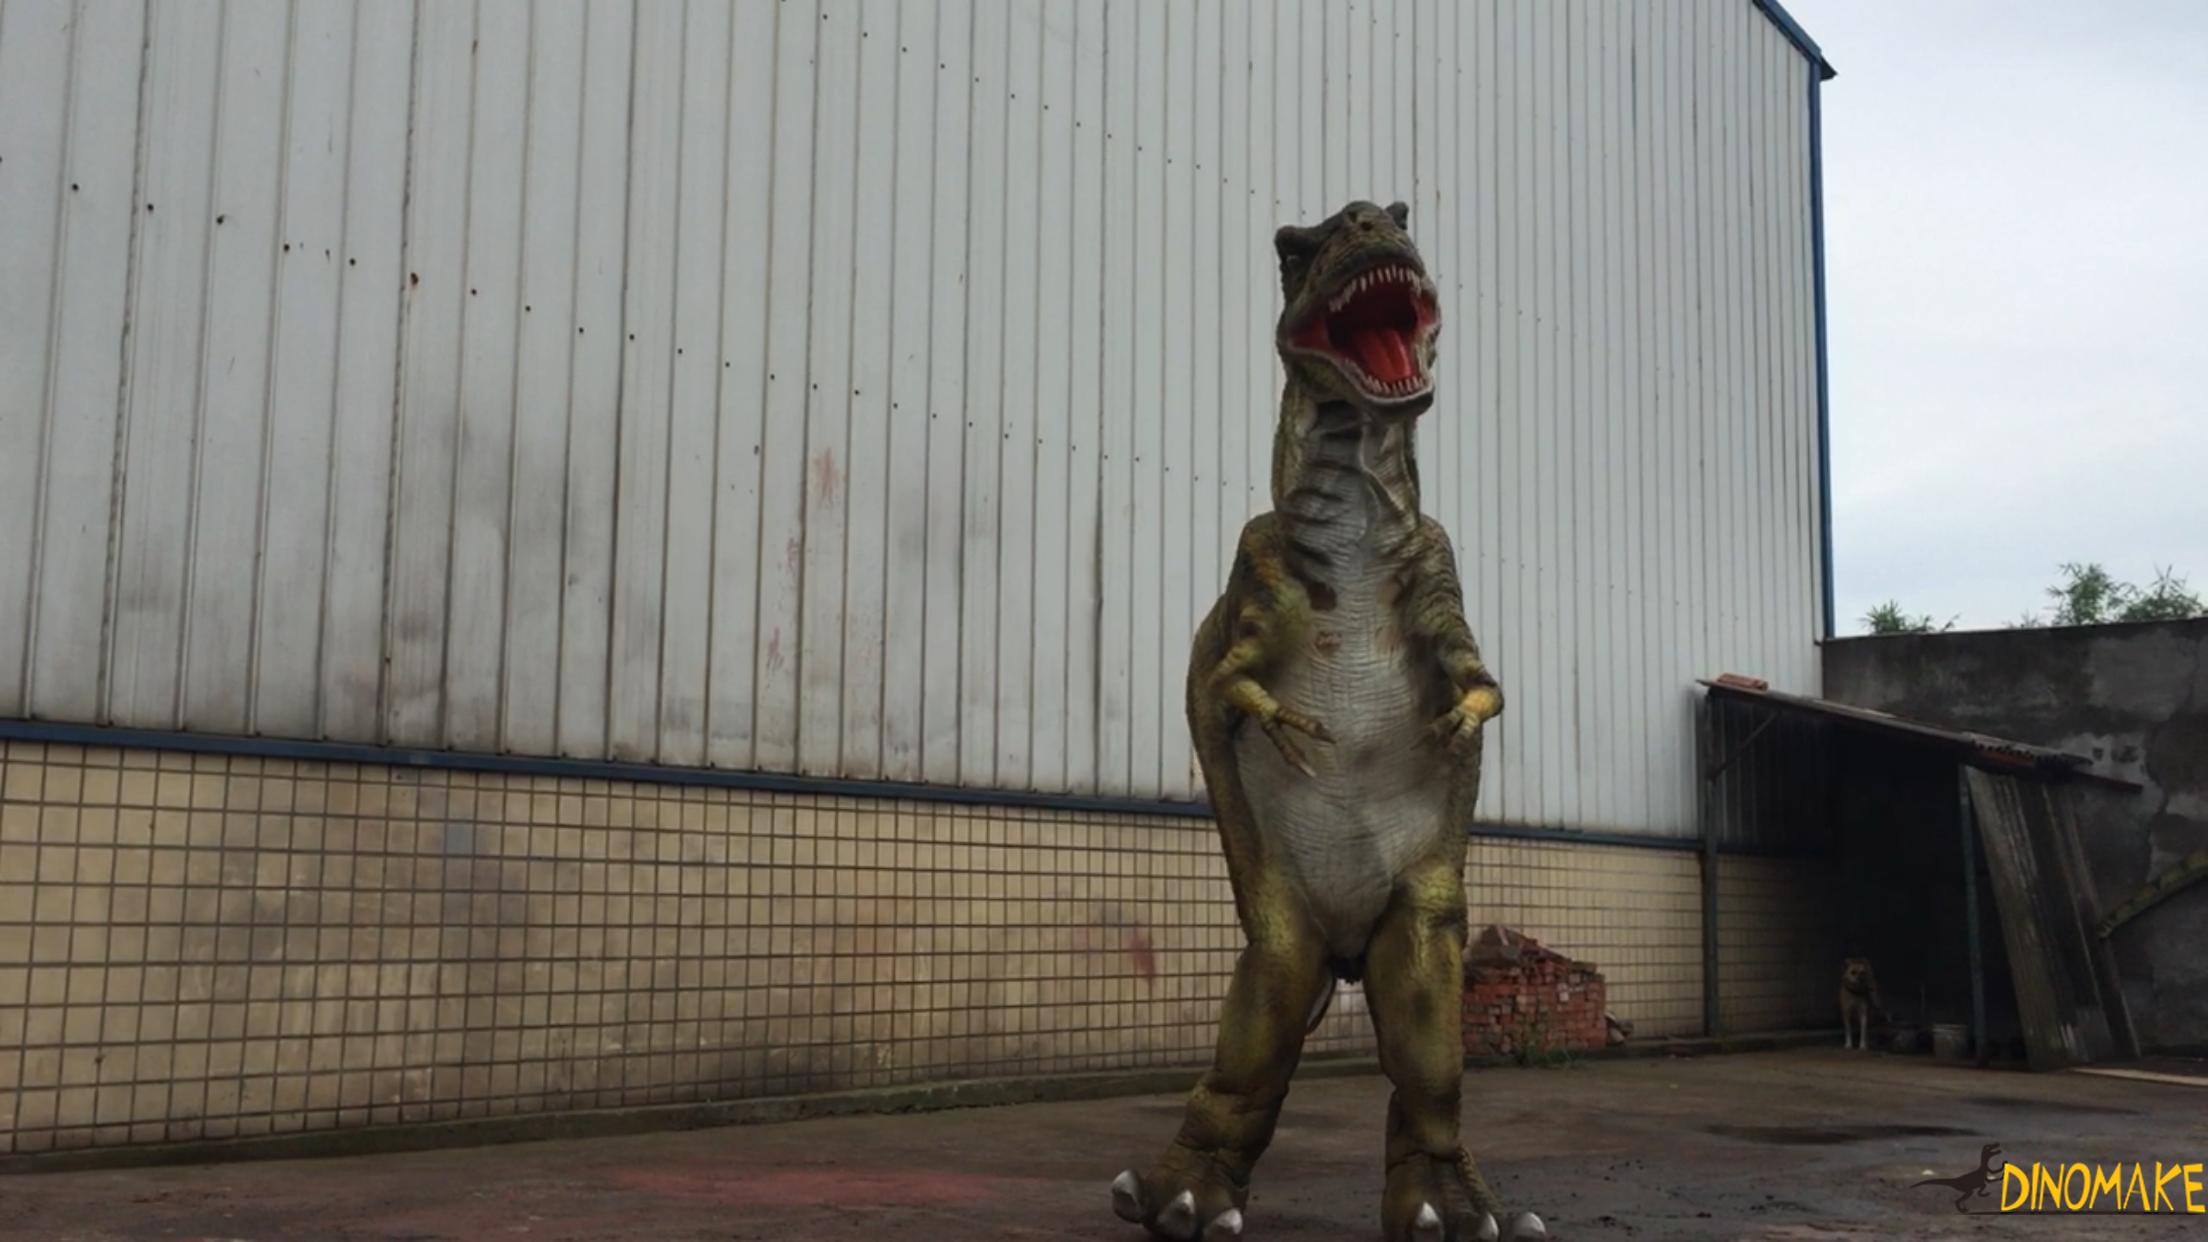 Outdoor equipment animatronic walking dinosaur costume model in legs